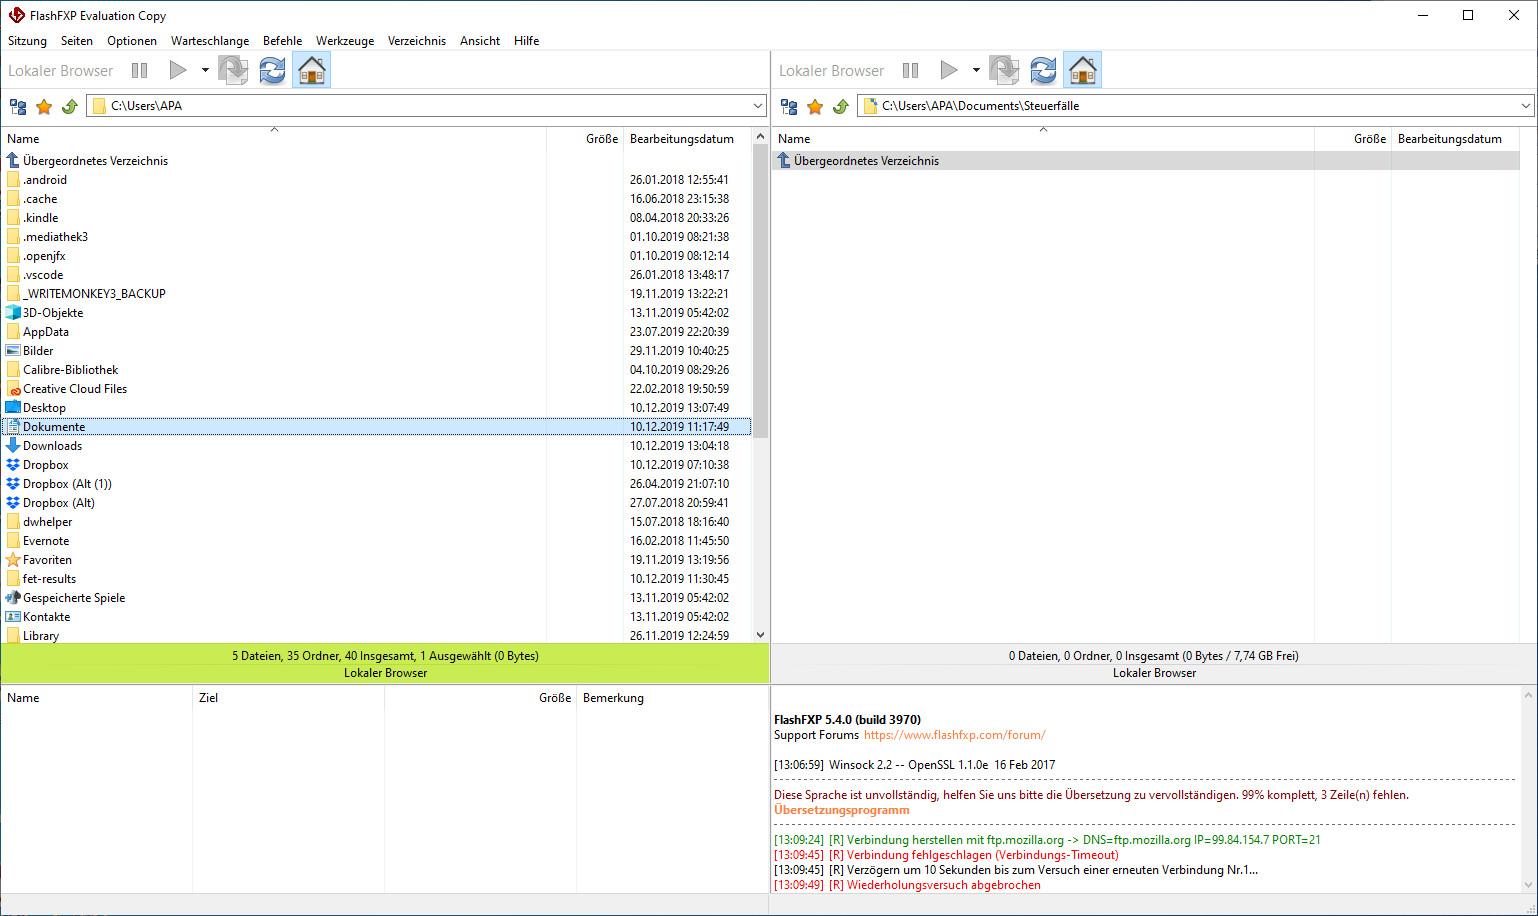 Screenshot 1 - FlashFXP